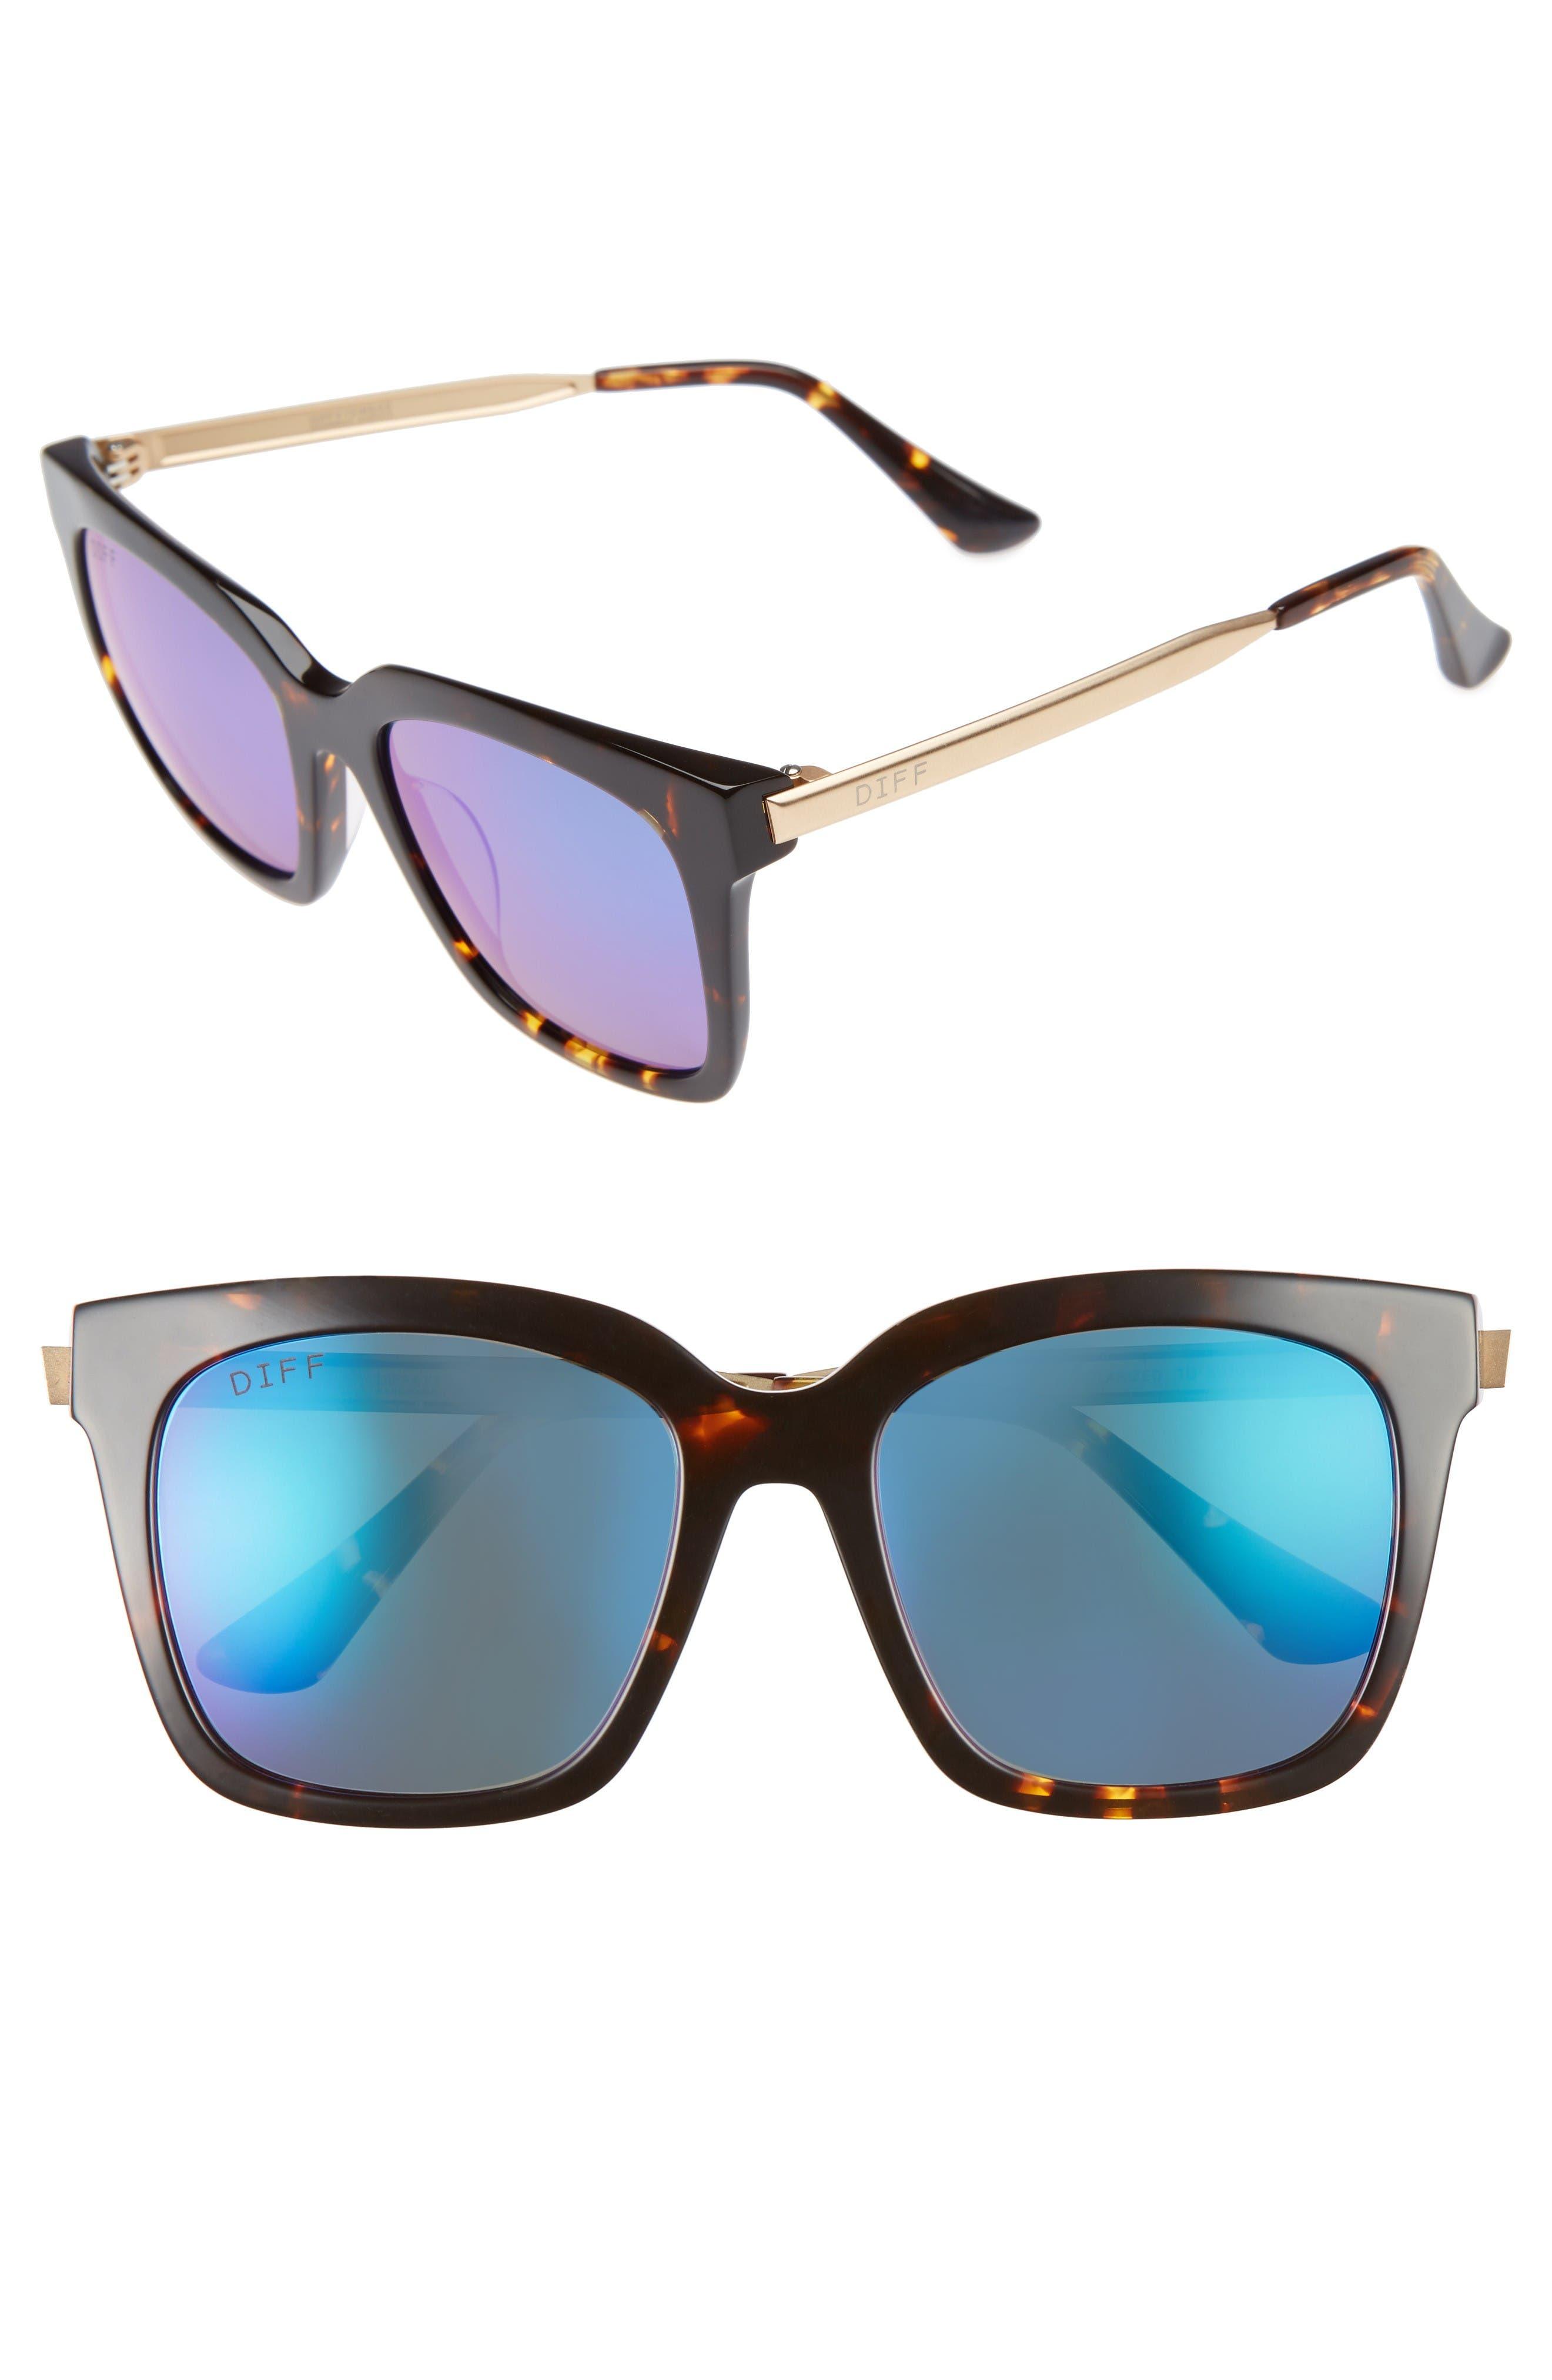 Bella 52mm Polarized Sunglasses,                             Main thumbnail 1, color,                             Tortoise/ Blue